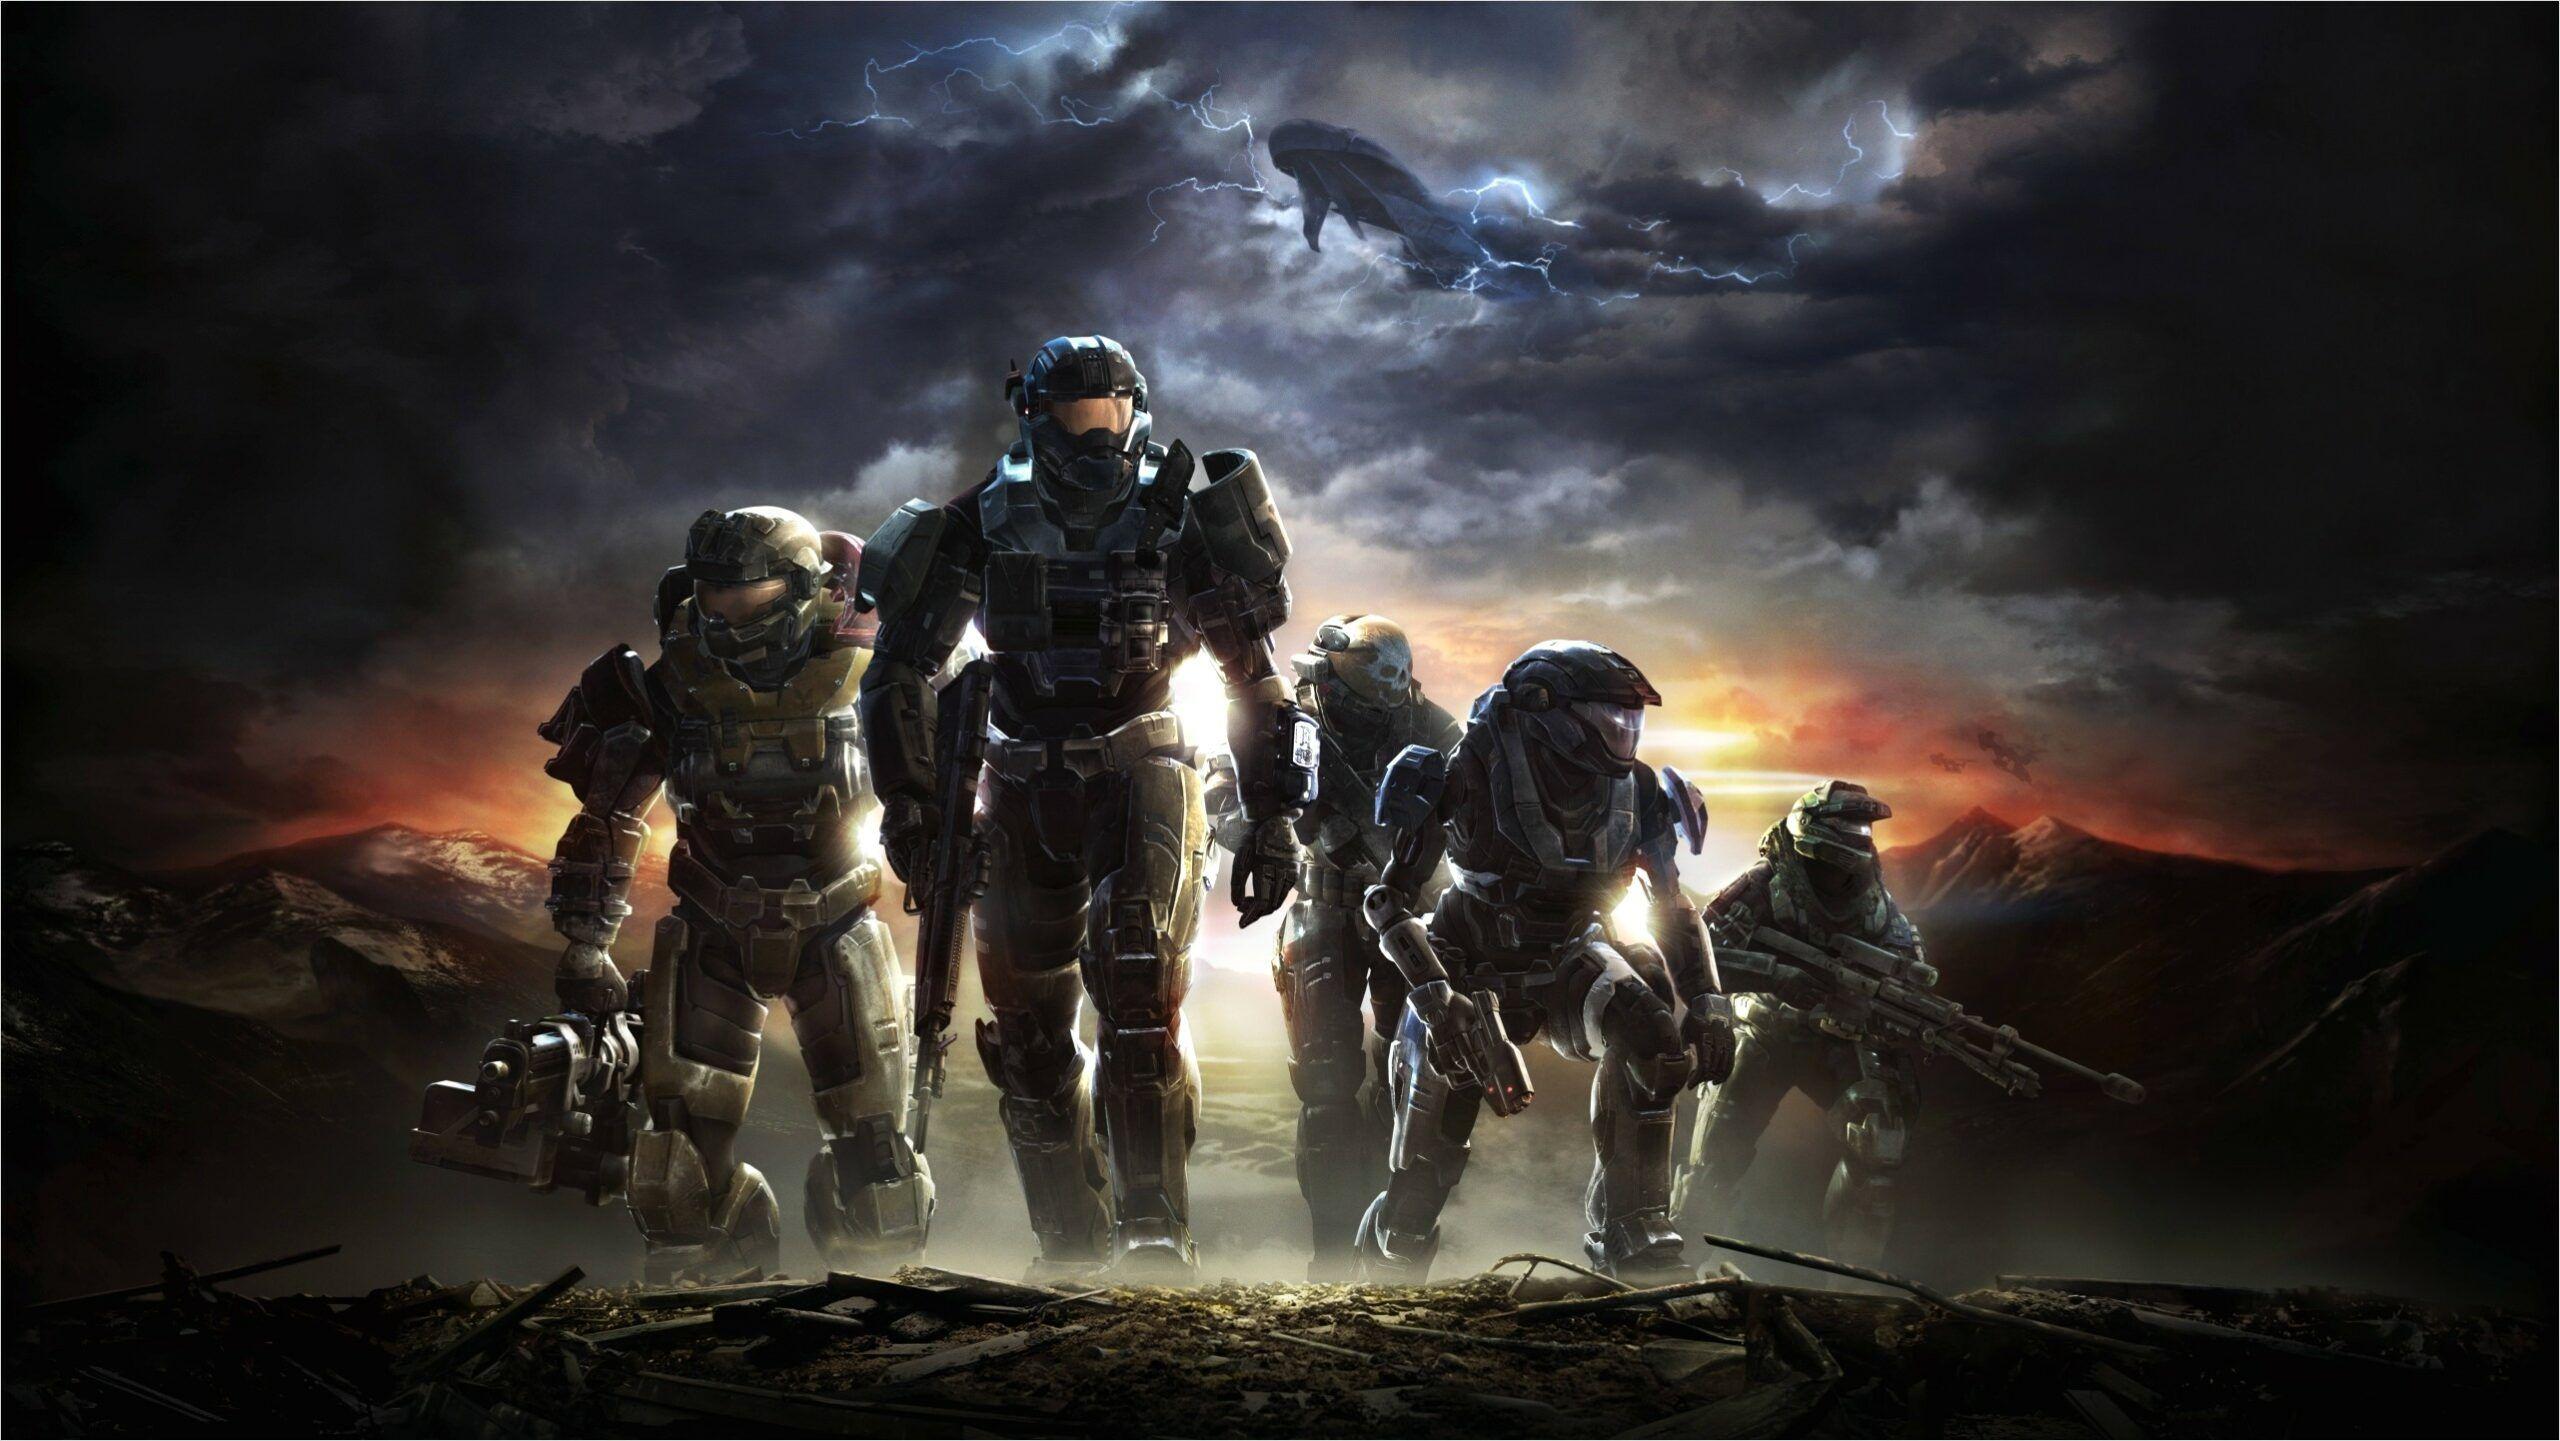 4k Halo Reach Wallpaper In 2020 Halo Reach Halo Master Chief Collection Halo Master Chief